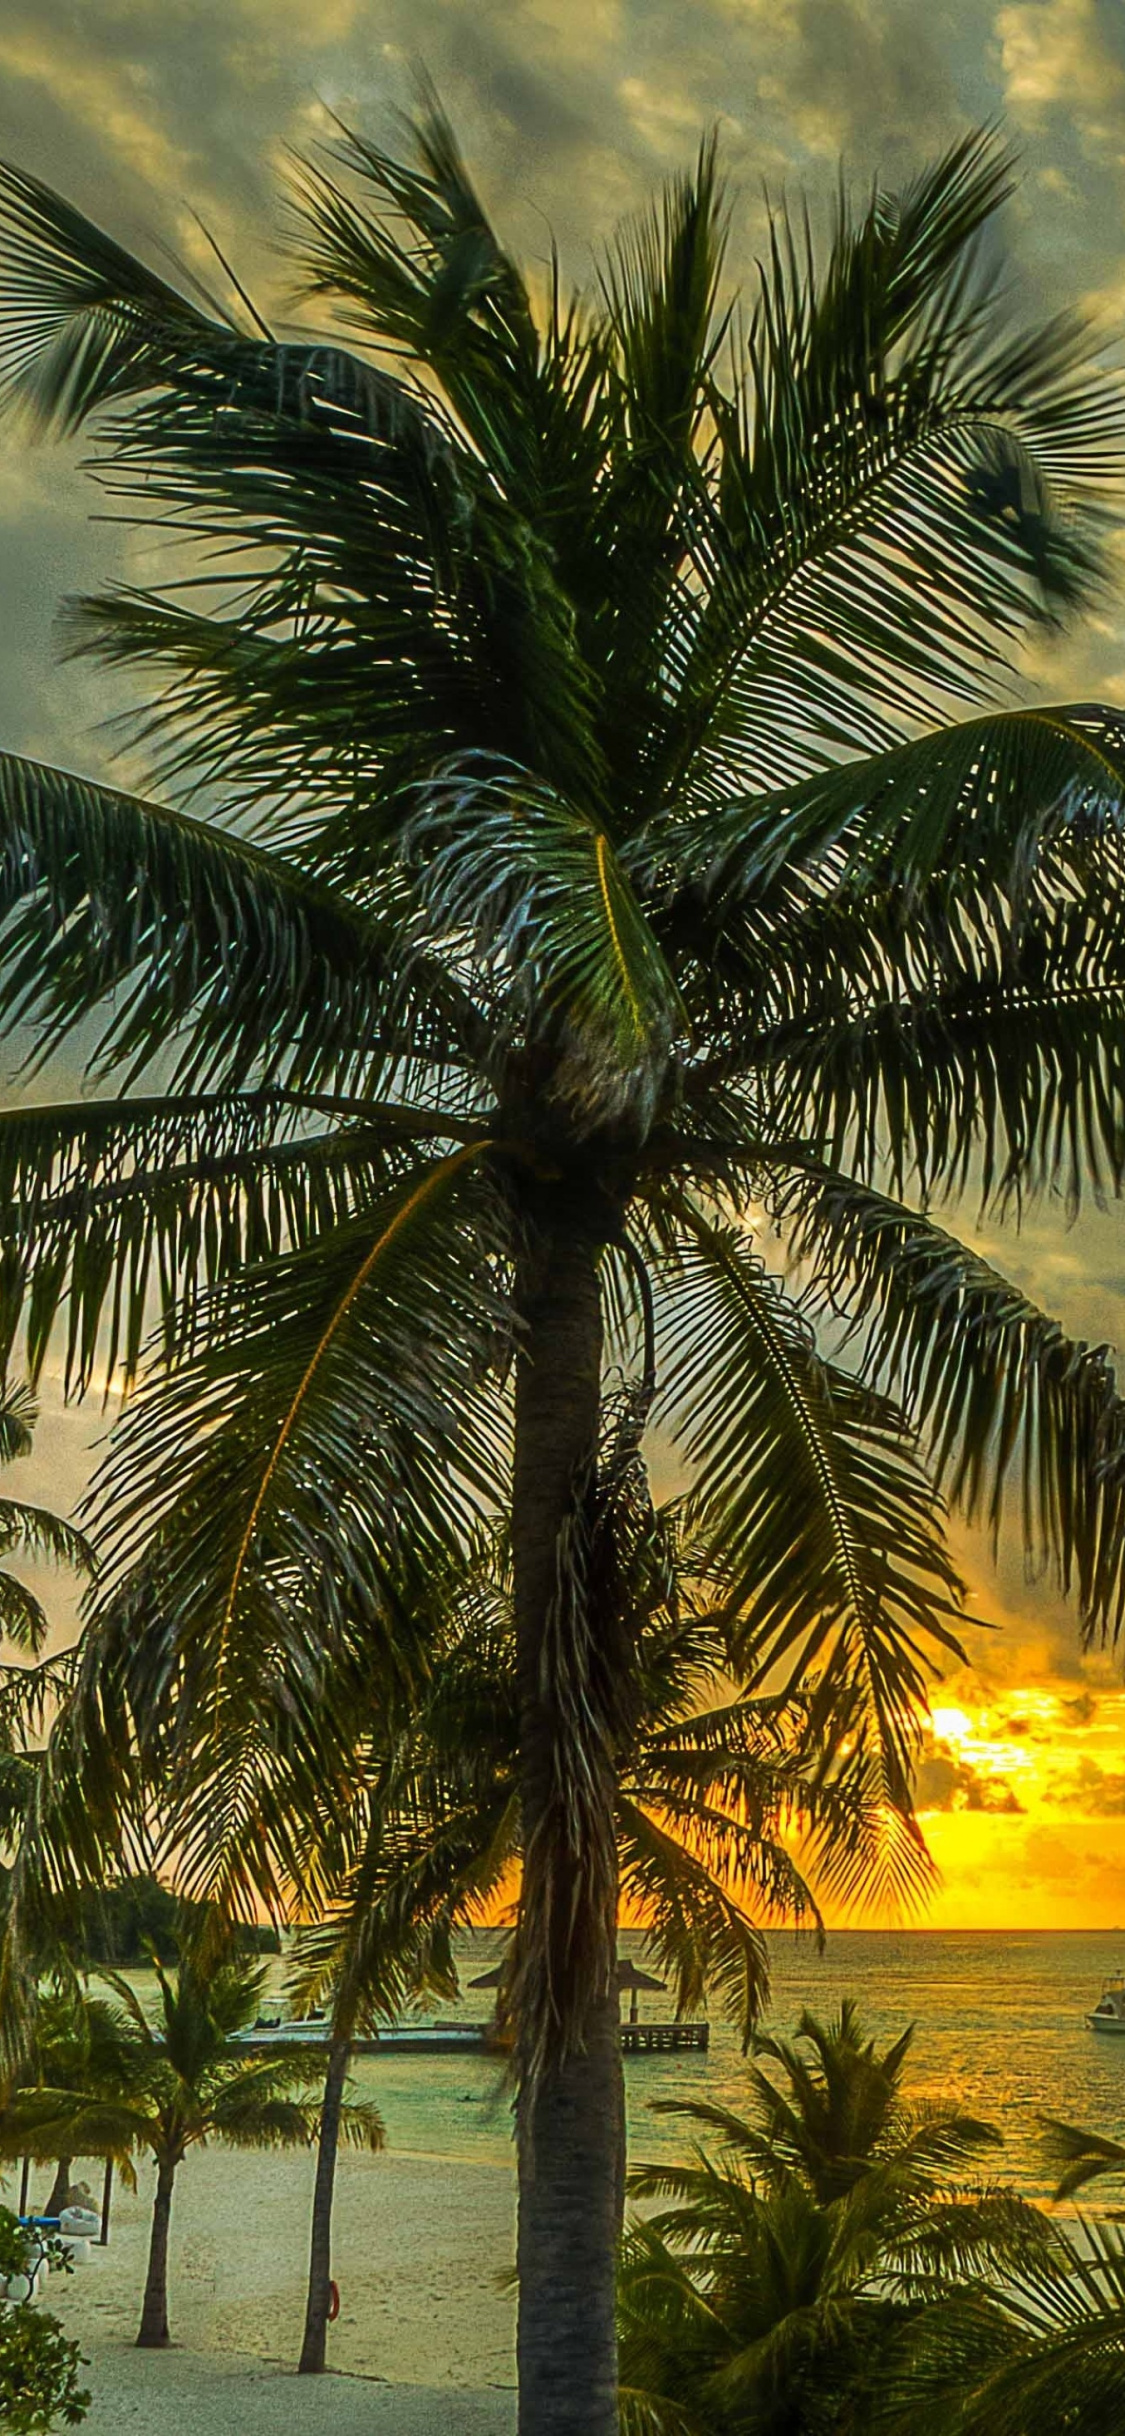 Tropics, Palm Tree, Vegetation, Date Palm, Tree Wallpaper - Обои Пальмы На Айфон , HD Wallpaper & Backgrounds